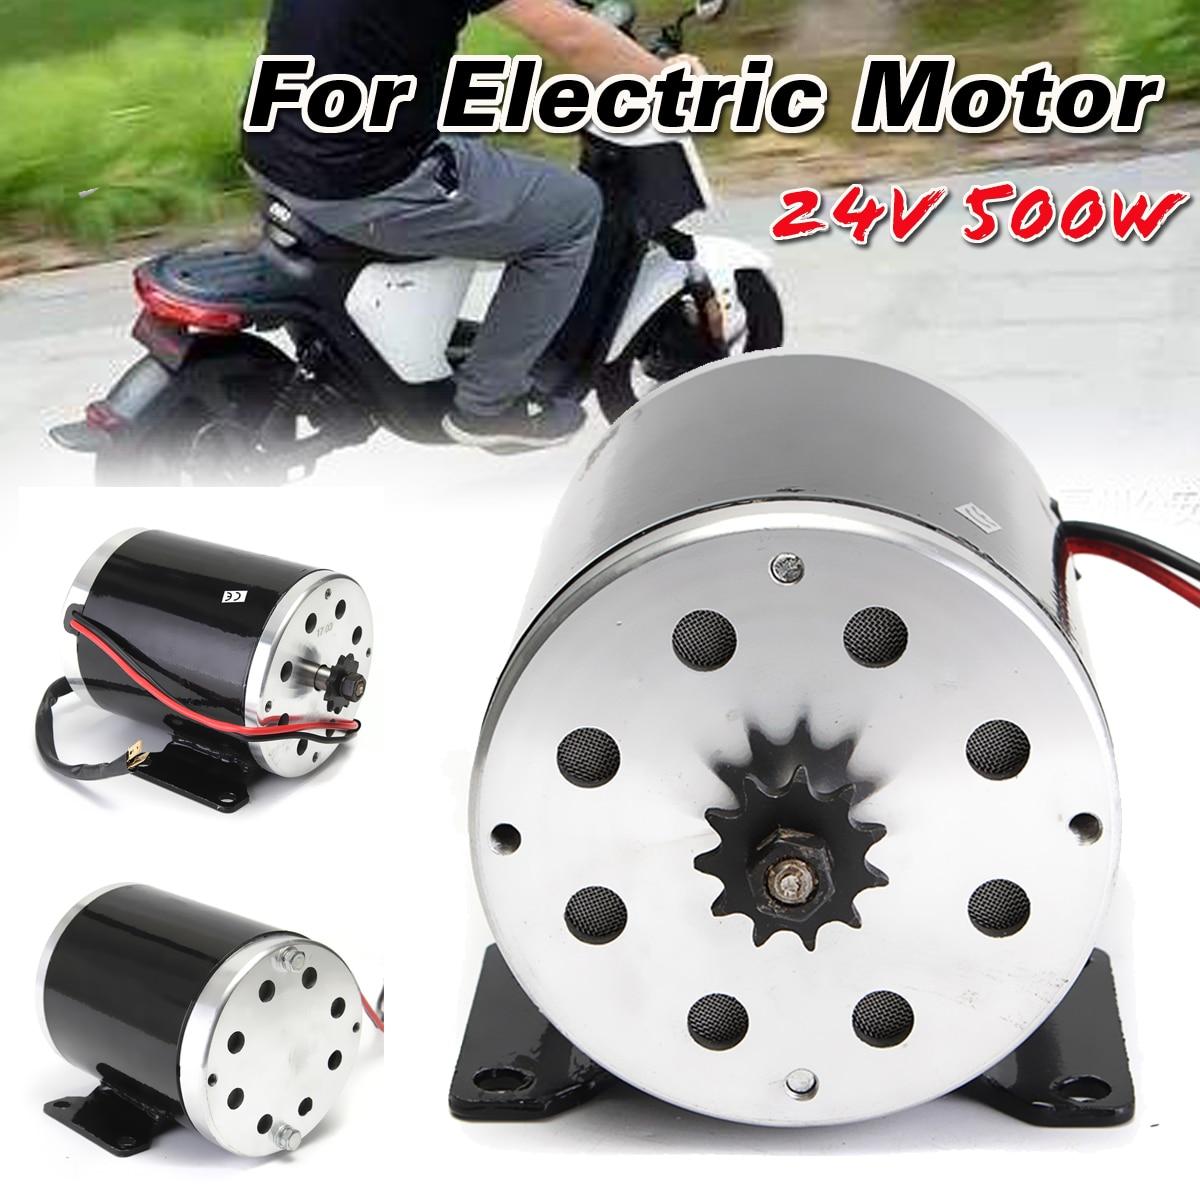 500W 2800RPM 24V Elektrisch Brushed Mo-tor Elektromotor Fr E-bike Roller GO-KART